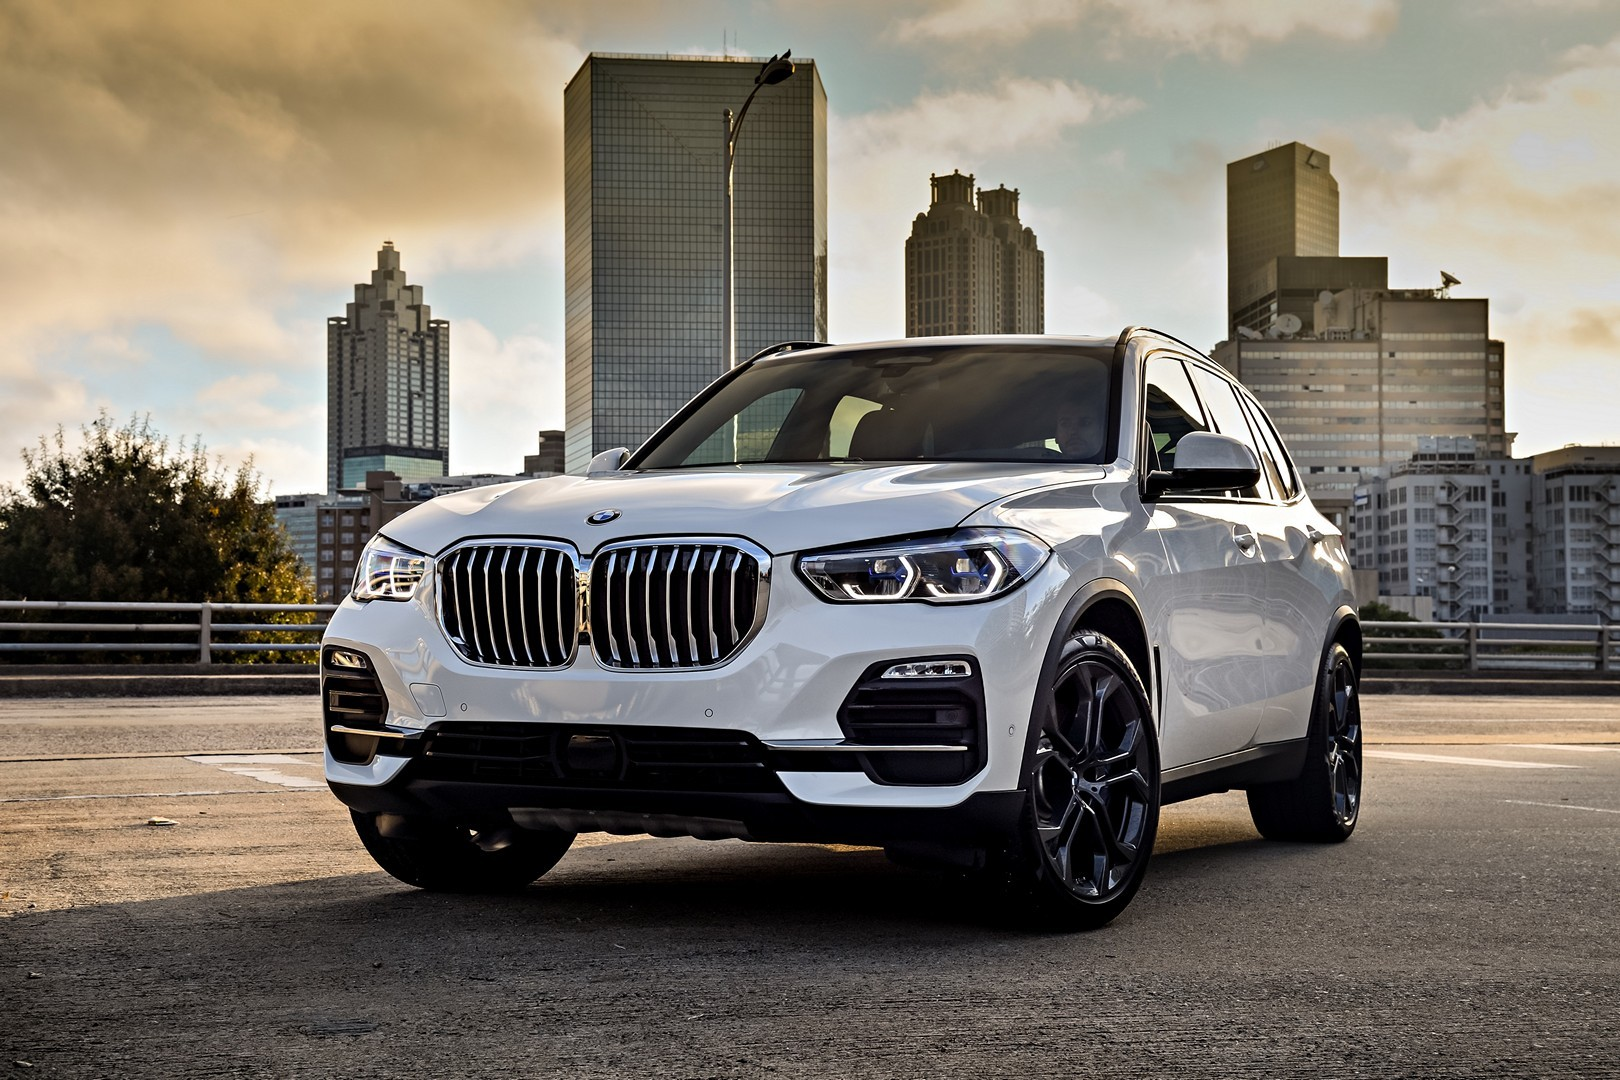 2020 BMW X5 Welcomes xDrive45 Plug-In Hybrid SUV ...